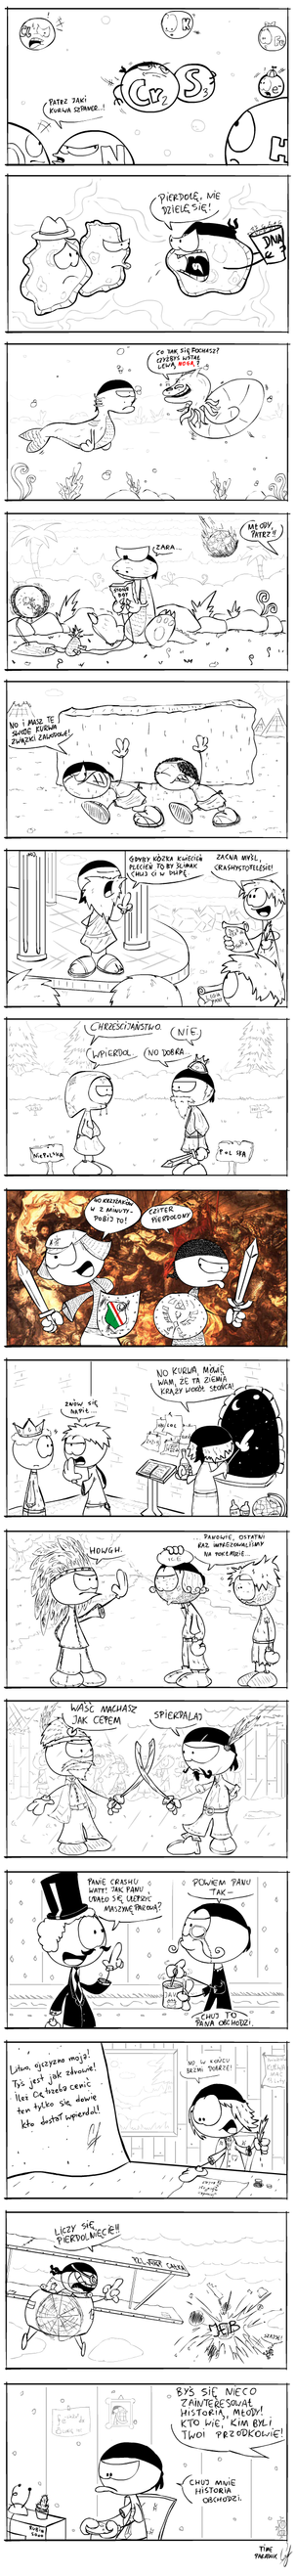 Crash's History Lesson by CrashPL